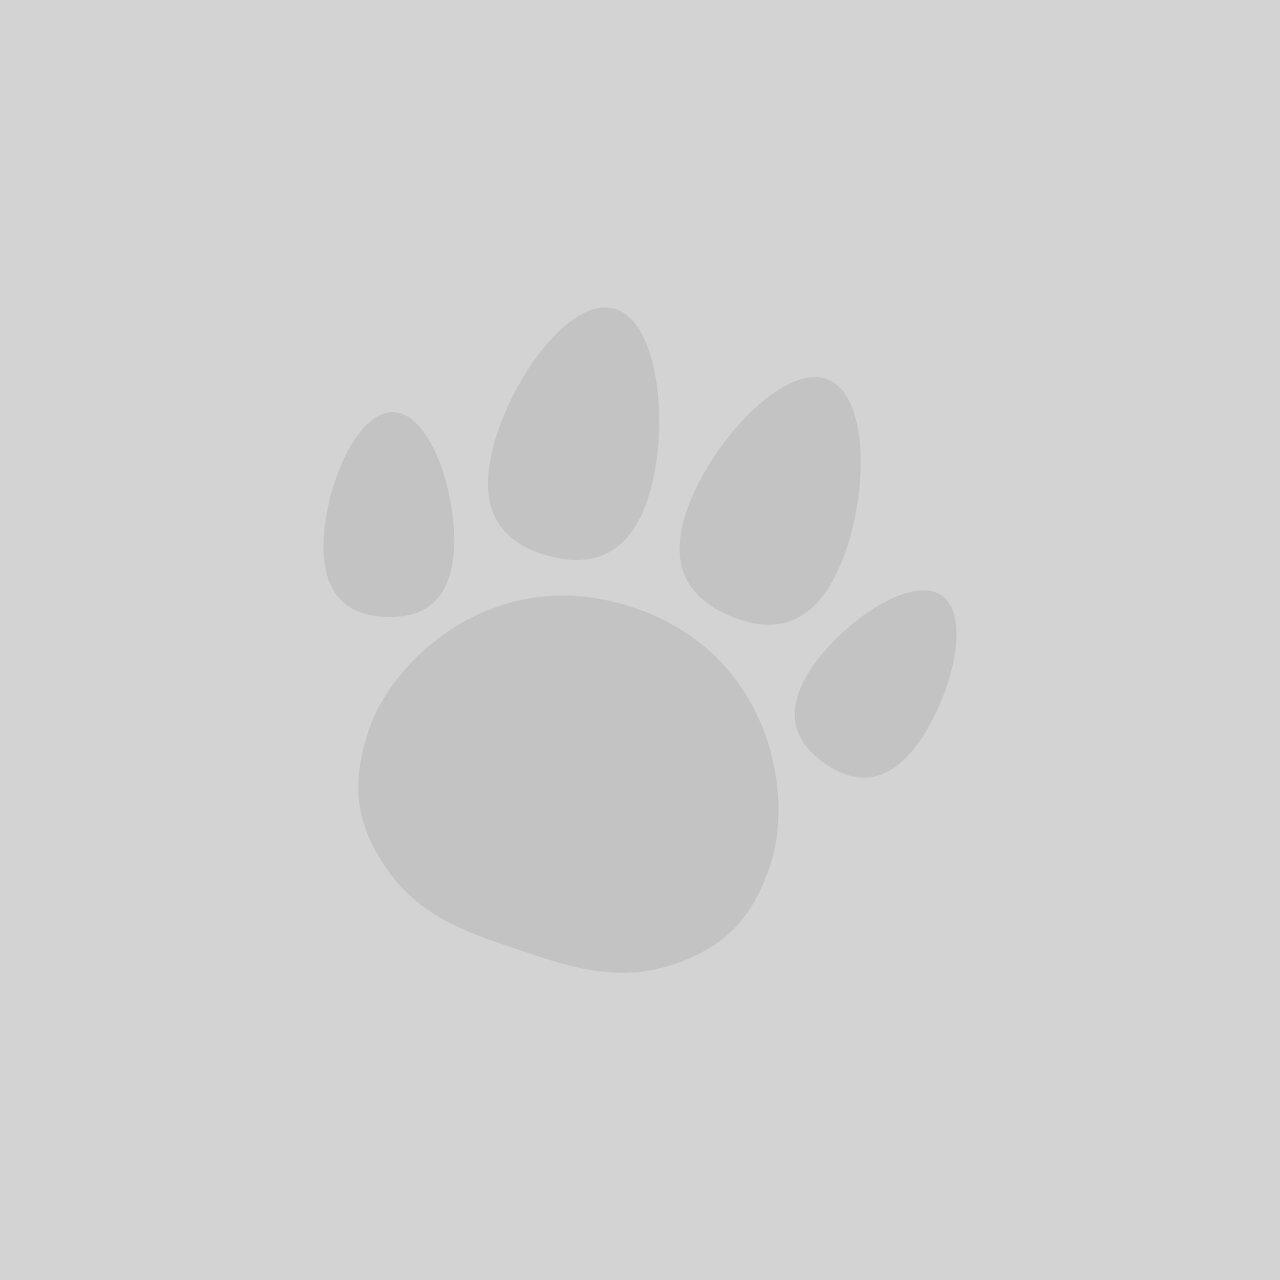 Cheeko Easy Up Fabric Kennel Large 91cm Dog Kennels